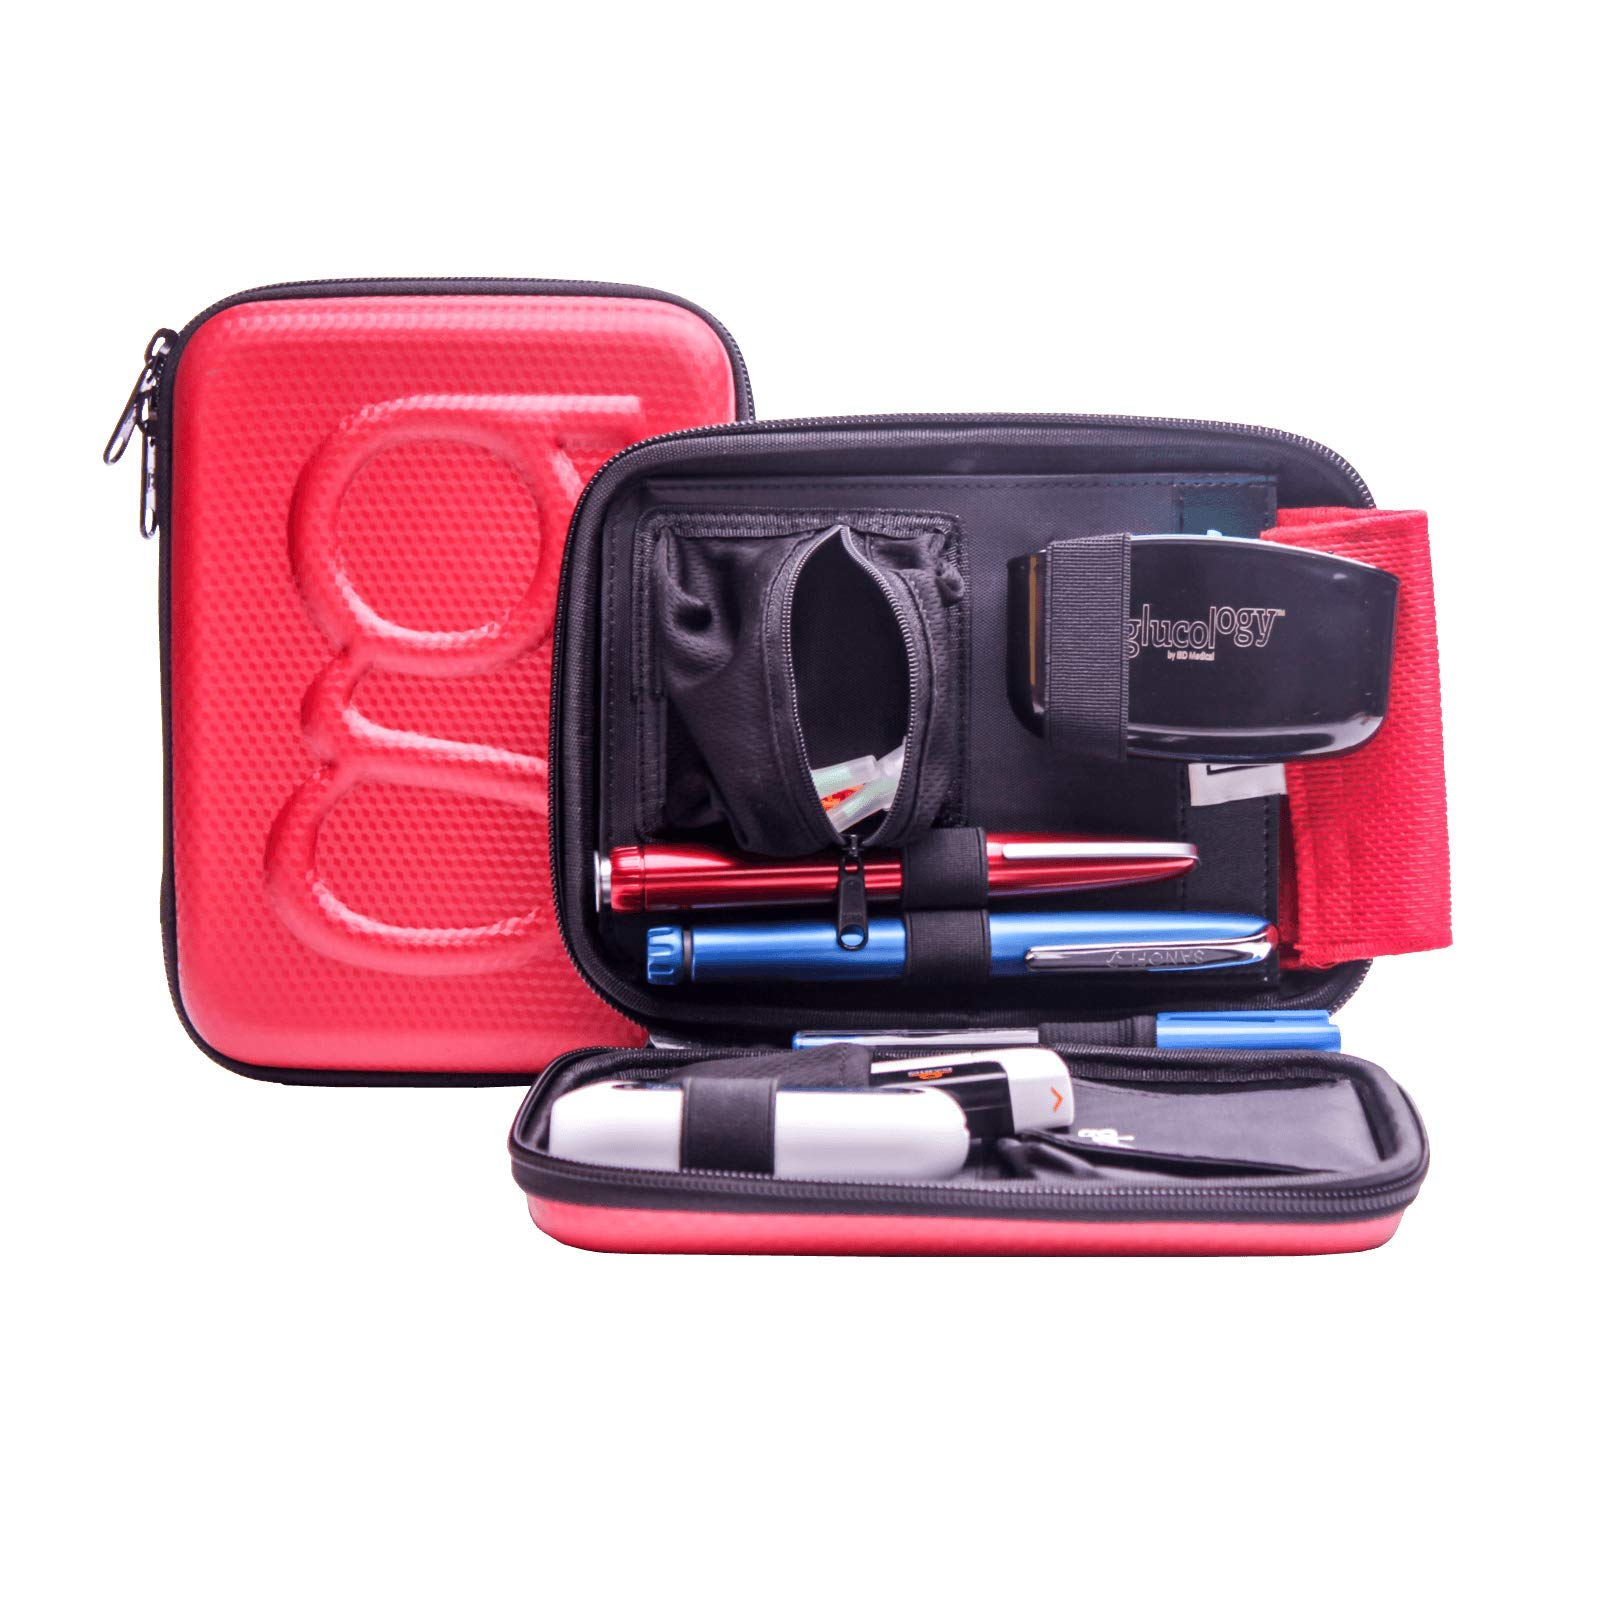 Glucology™ Diabetic Travel Case - Organizer Pack for Blood Sugar Test Strips, Medication, Glucose Meter, Pills, Tablets, Pens, Insulin Syringes, Needles, Lancets - Hard Shell - Standard, Textured Red